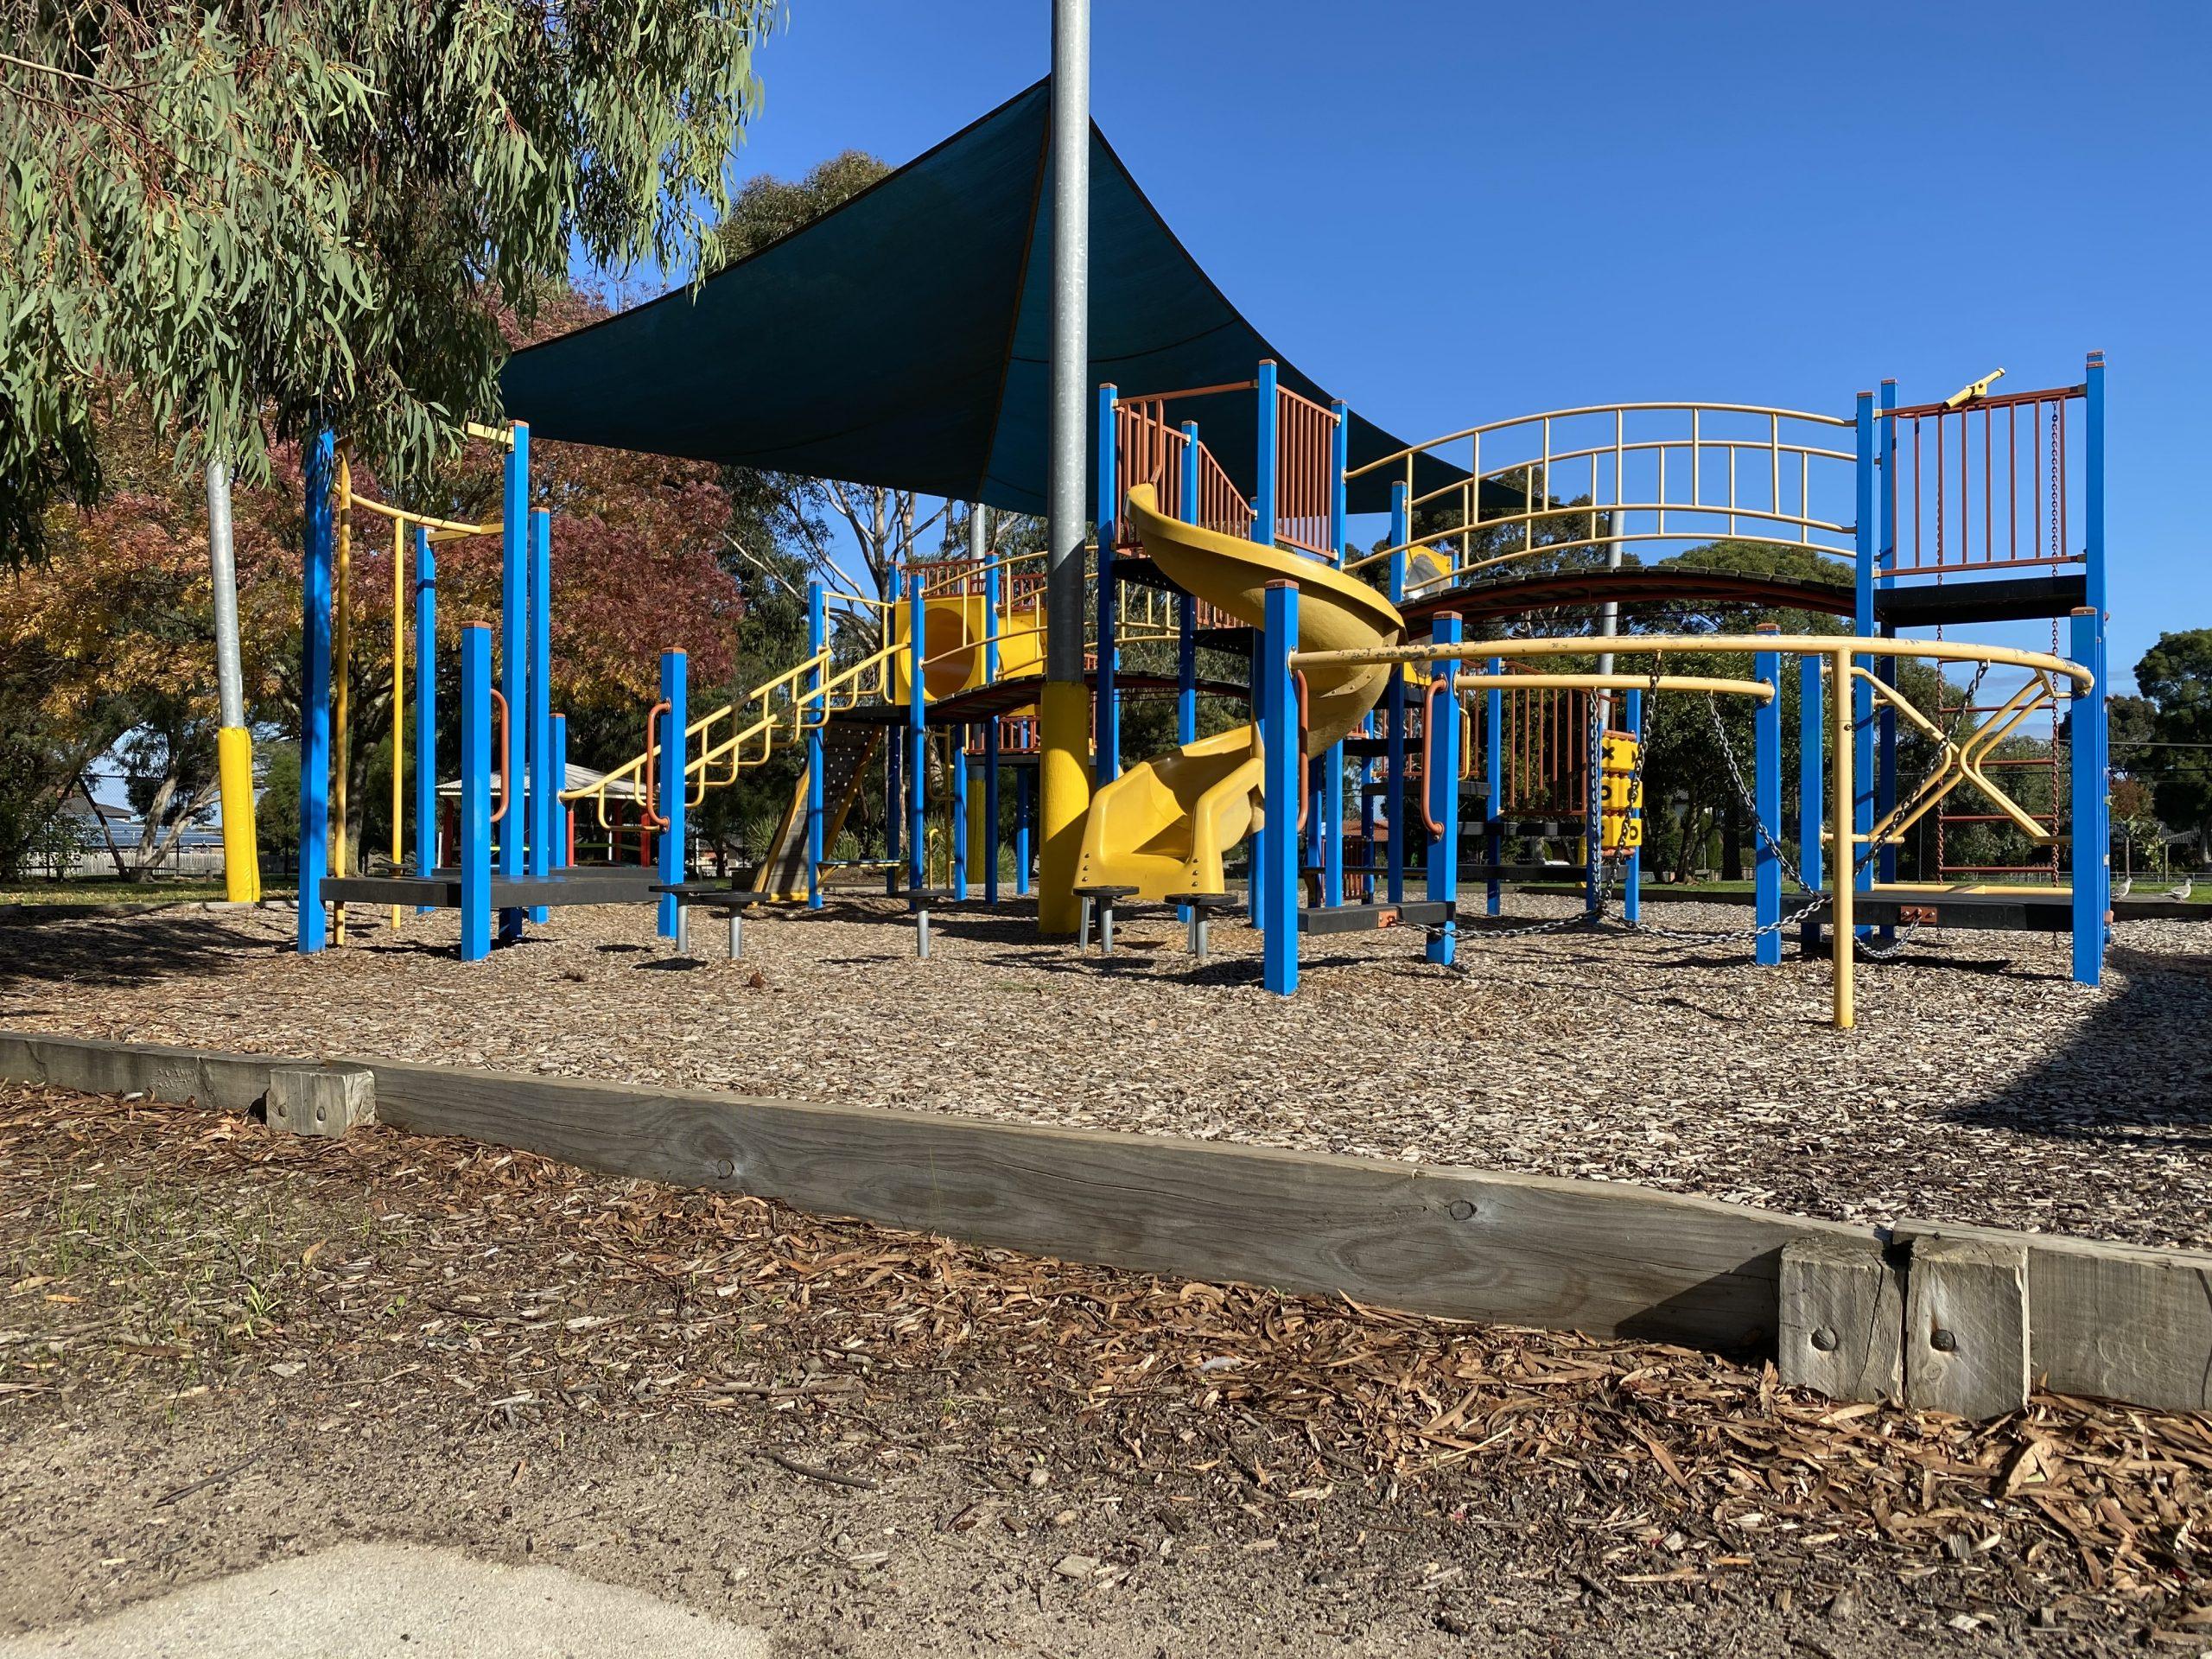 Playground scaled